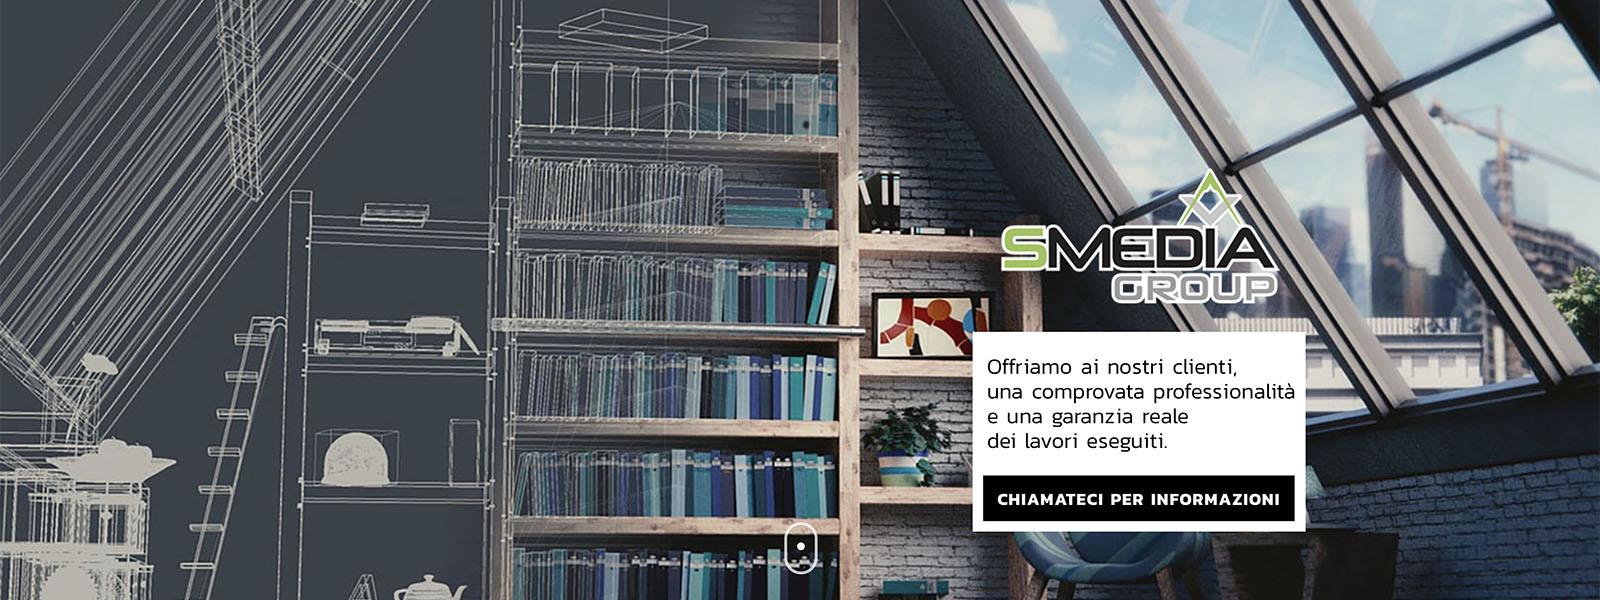 Sito Web Smedia Group Srl